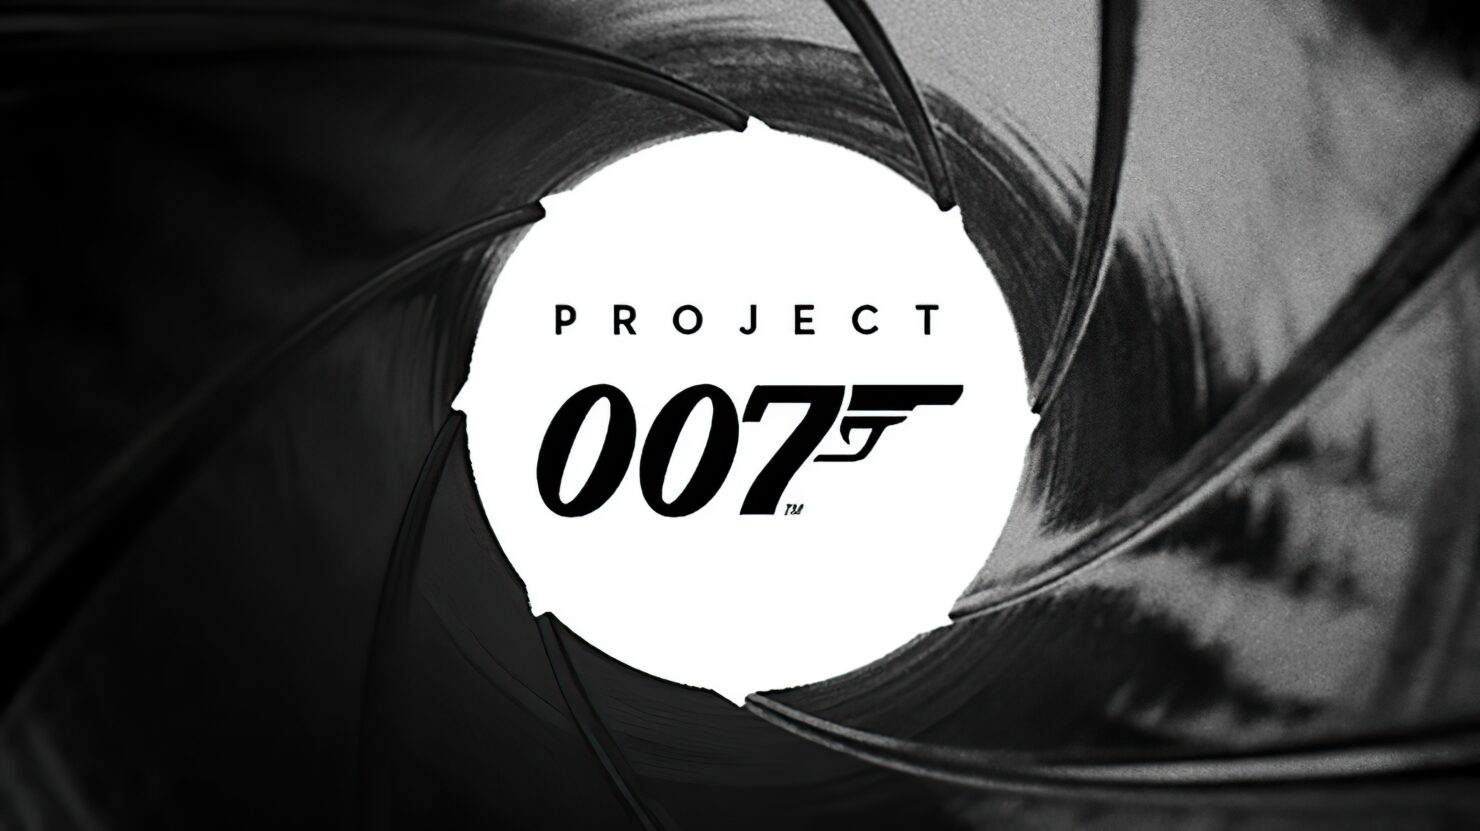 James Bond Game